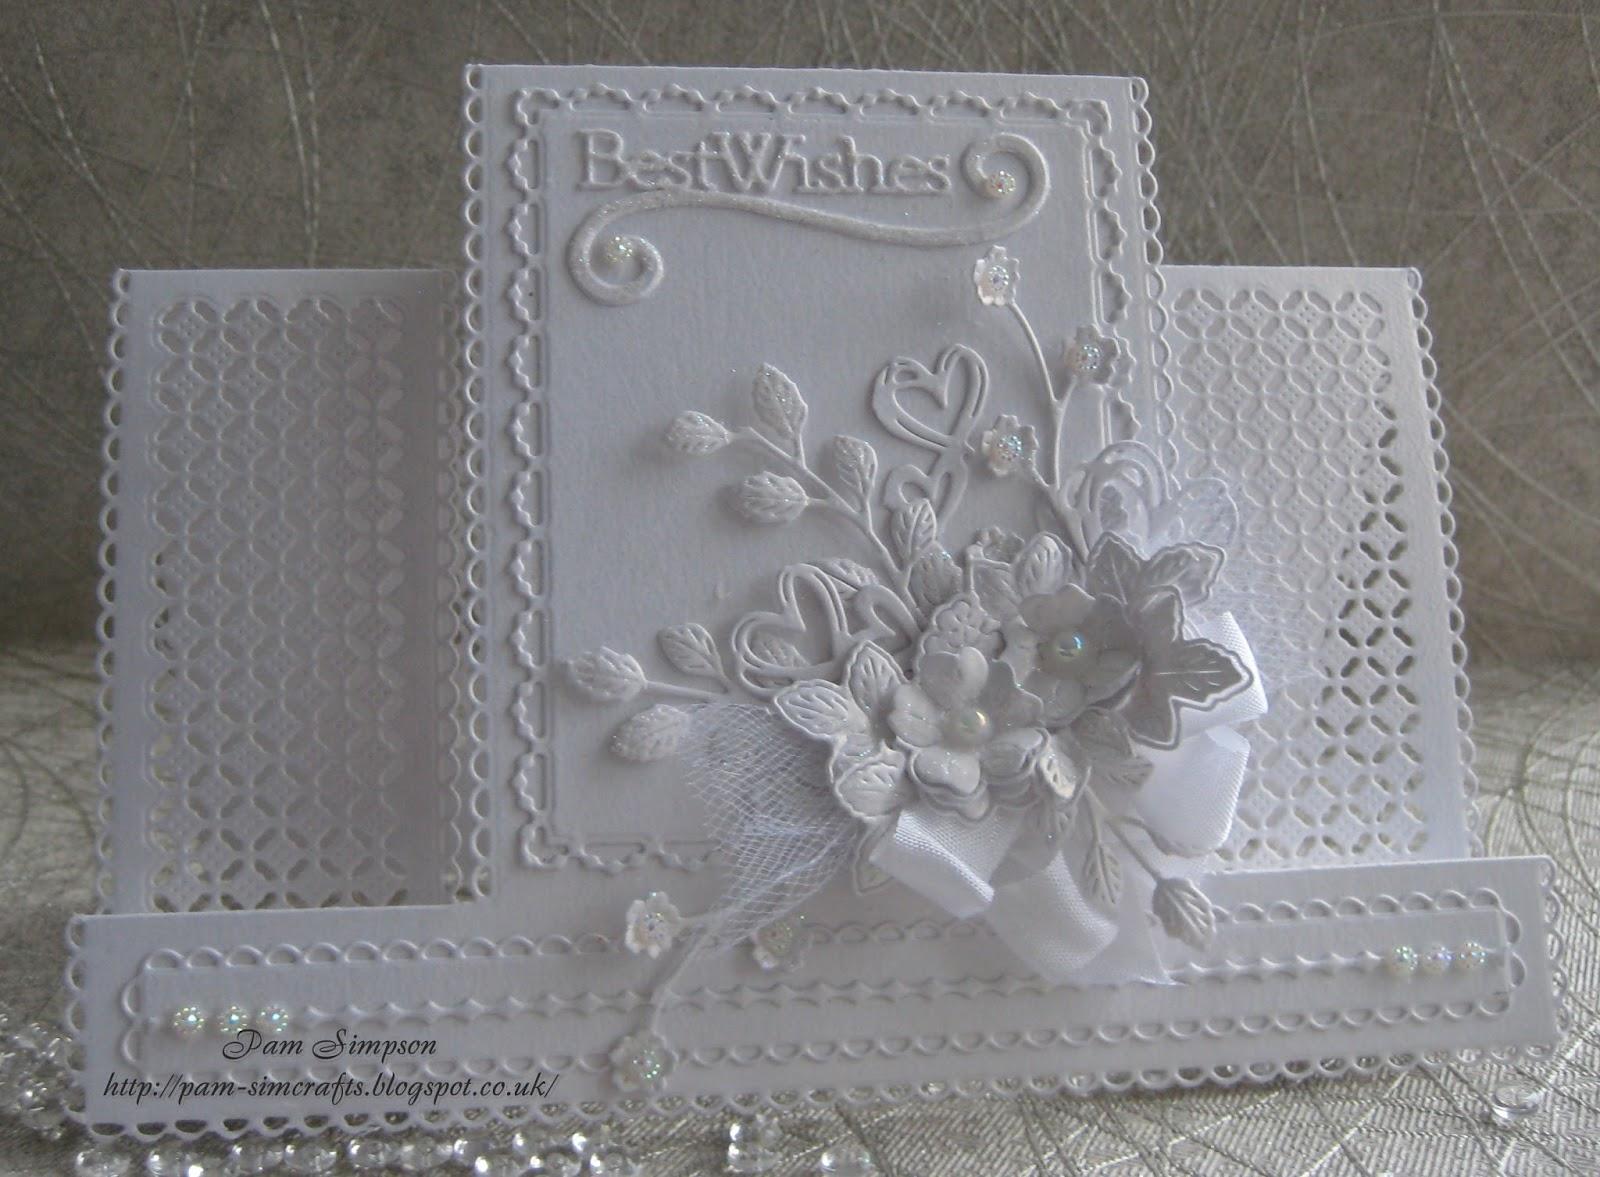 pamscrafts: White on White Birthday Card.